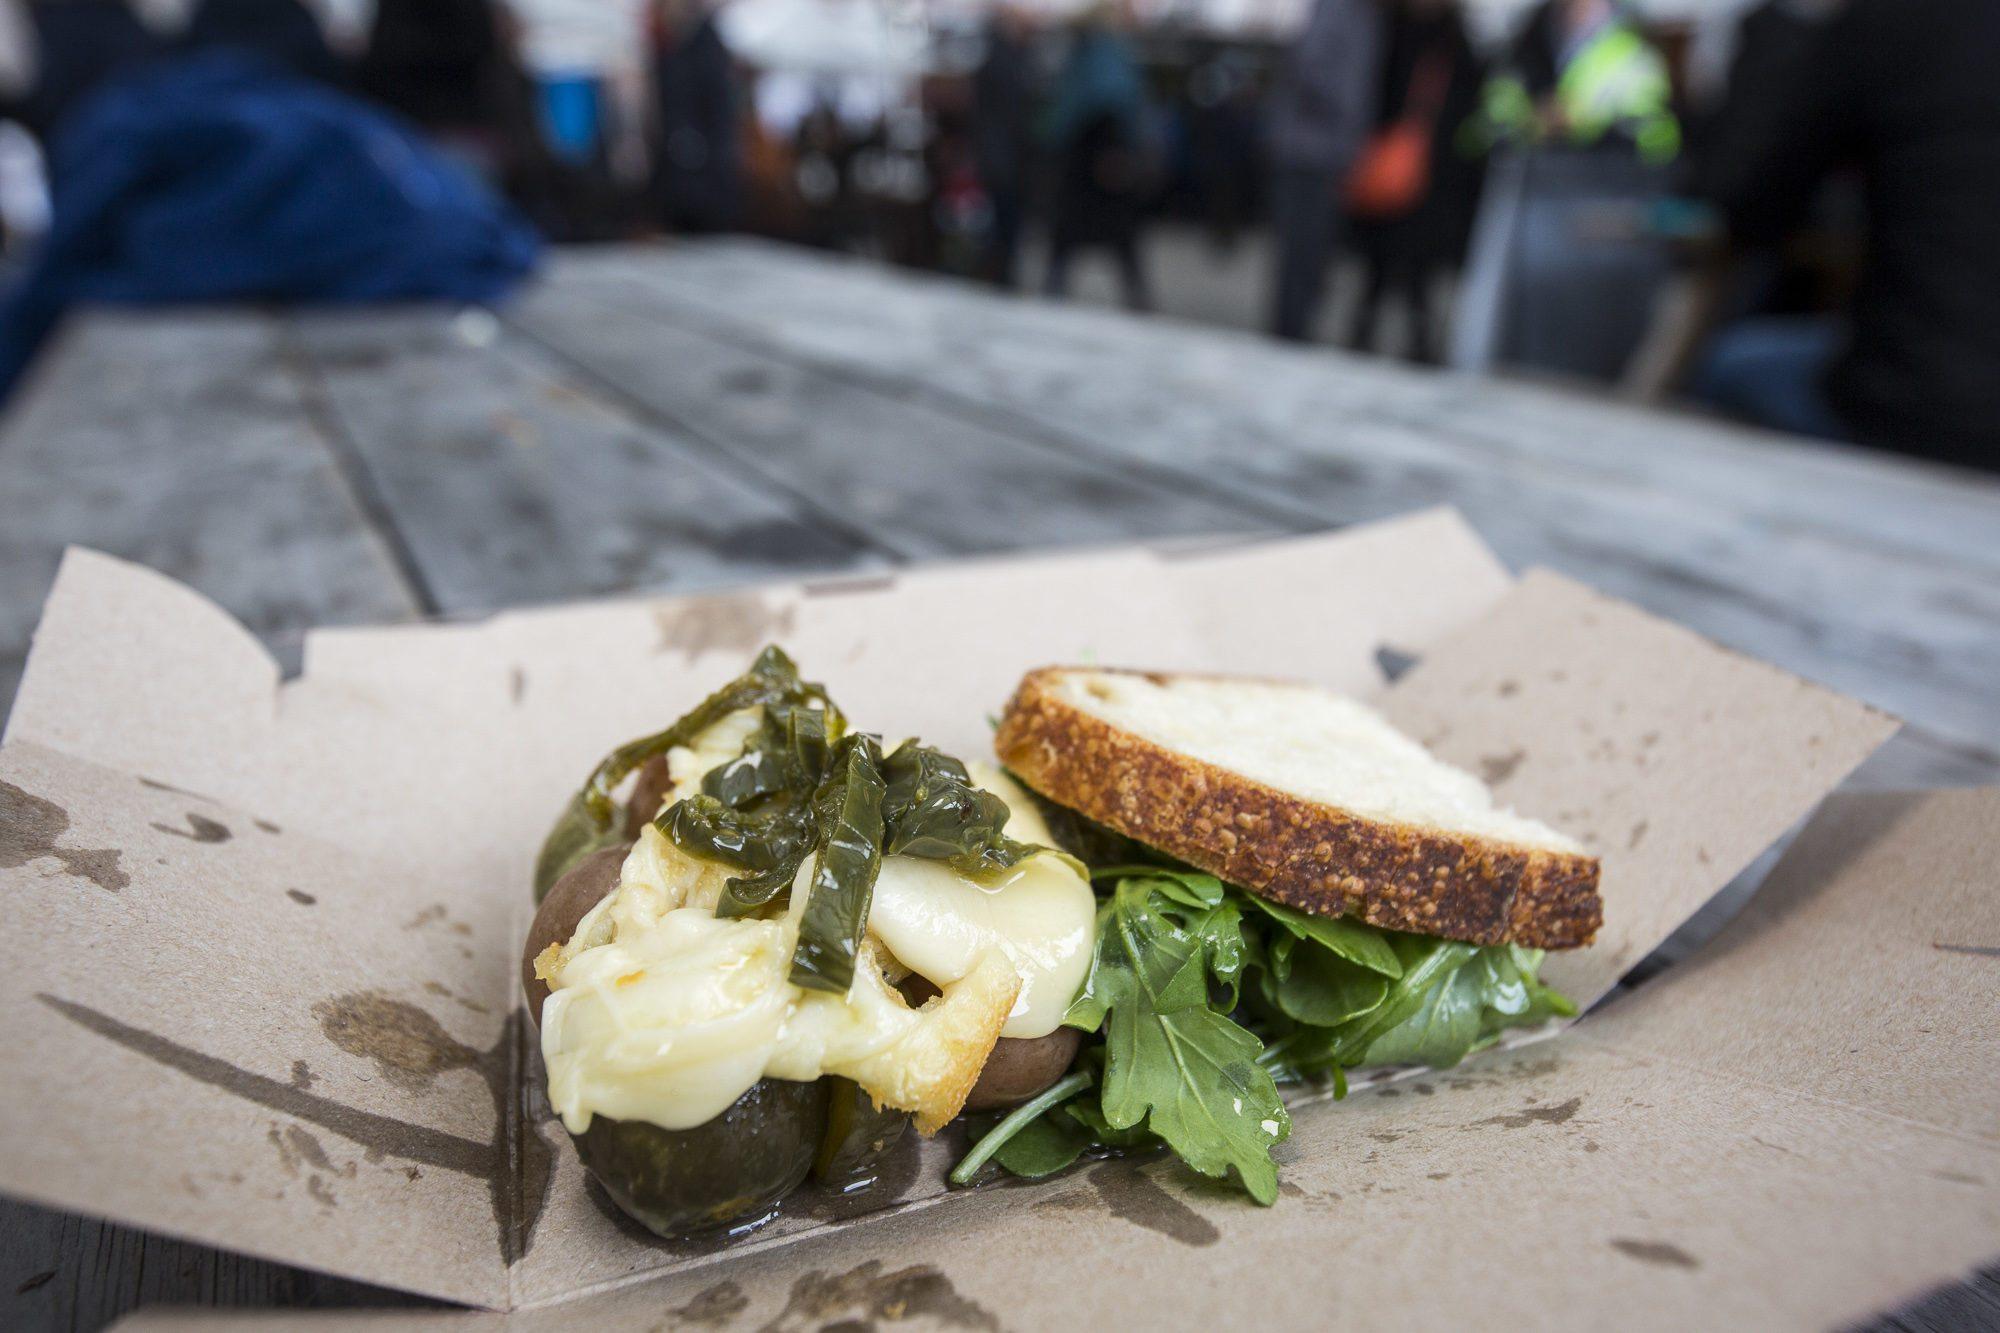 toronto-food-events-evergreen-brick-works-winter-village-christmas-market-raclette